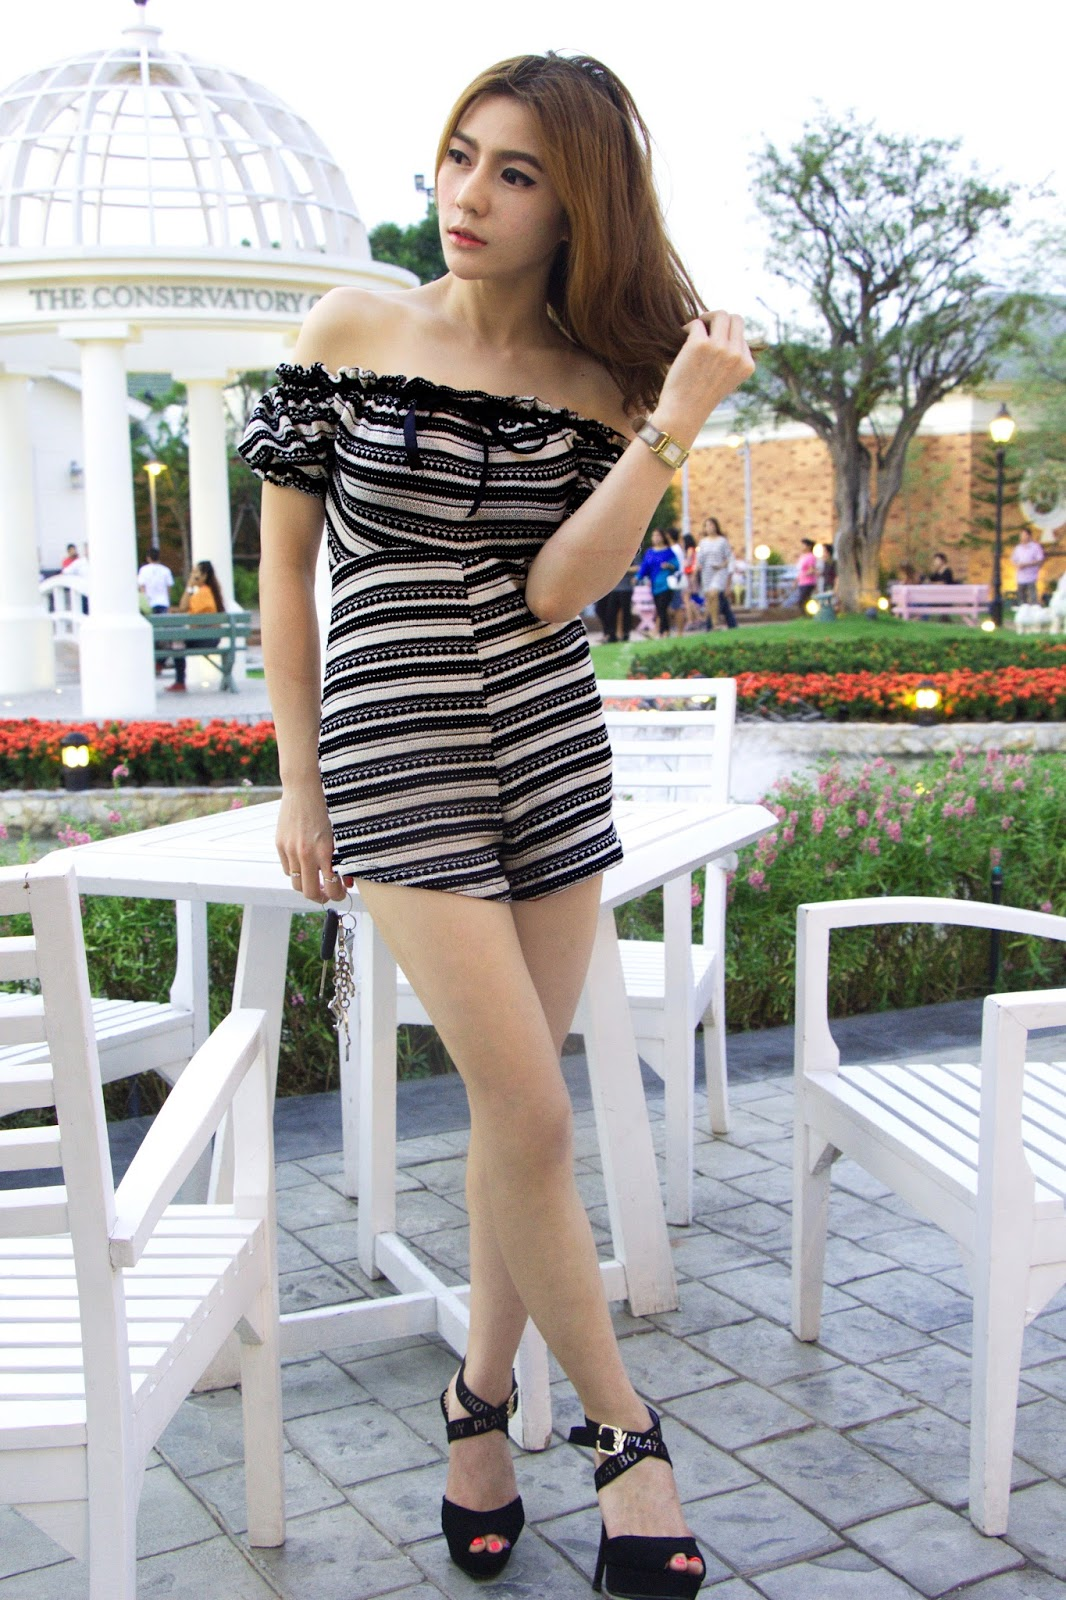 Snap Xnxx Hai Binh model Beautiful girl xnxx images photos ...